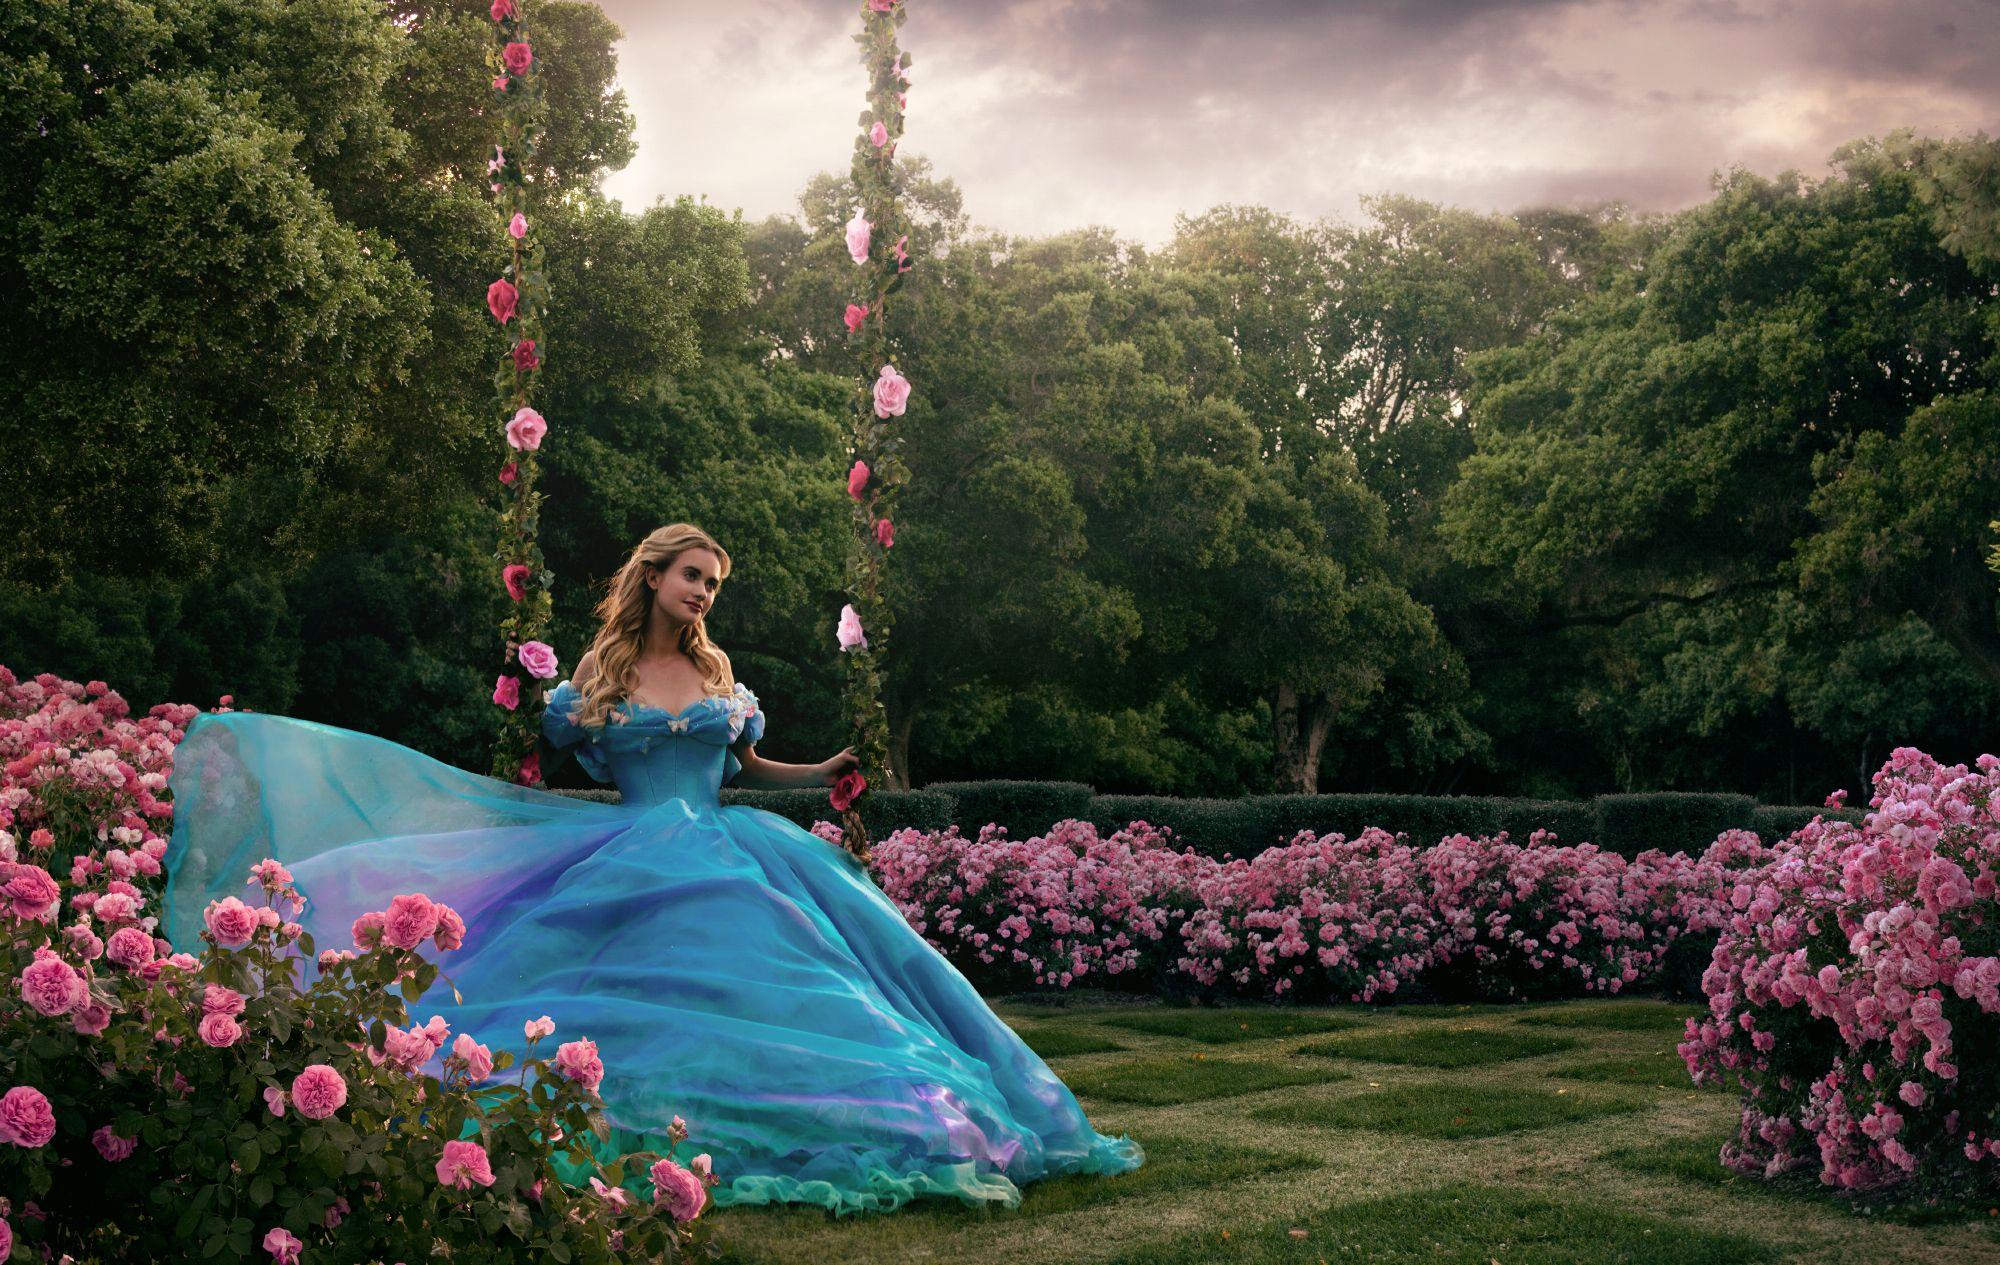 Secret Garden: Secret Garden By Michellemonique